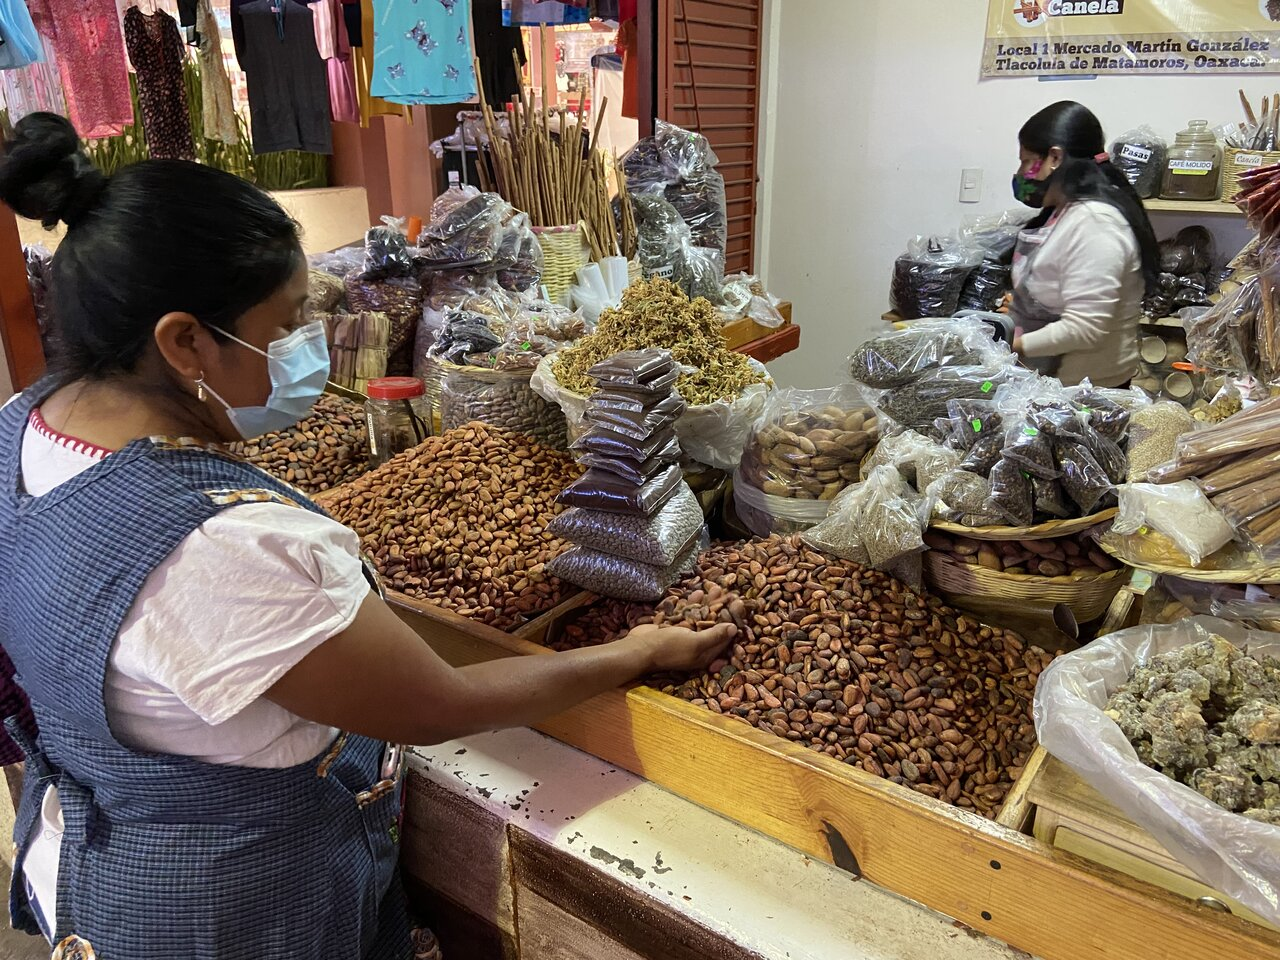 Buying fresh ingredients at the market   Photo taken by Jazmin D